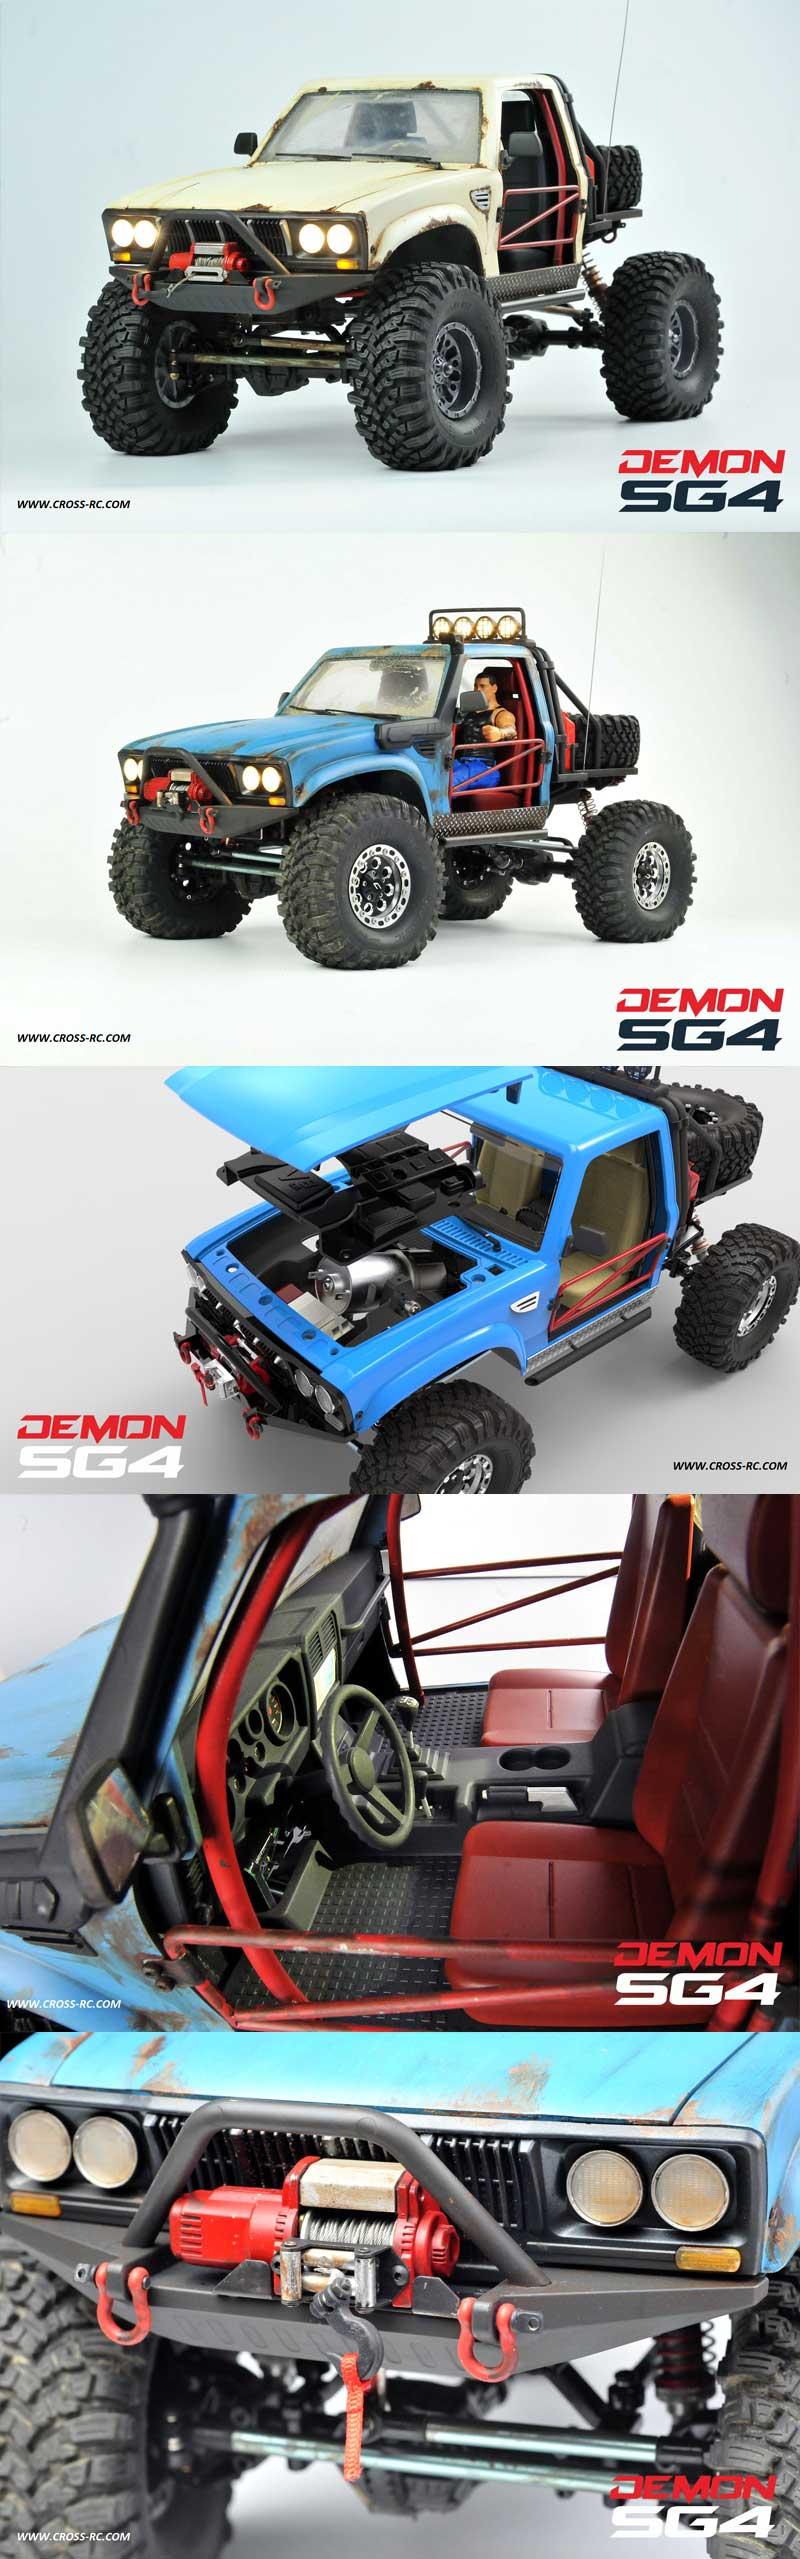 SG4C Demon 4x4 Crawler Kit, w/ Hard Body and CNC Gears, 1/10 Scale